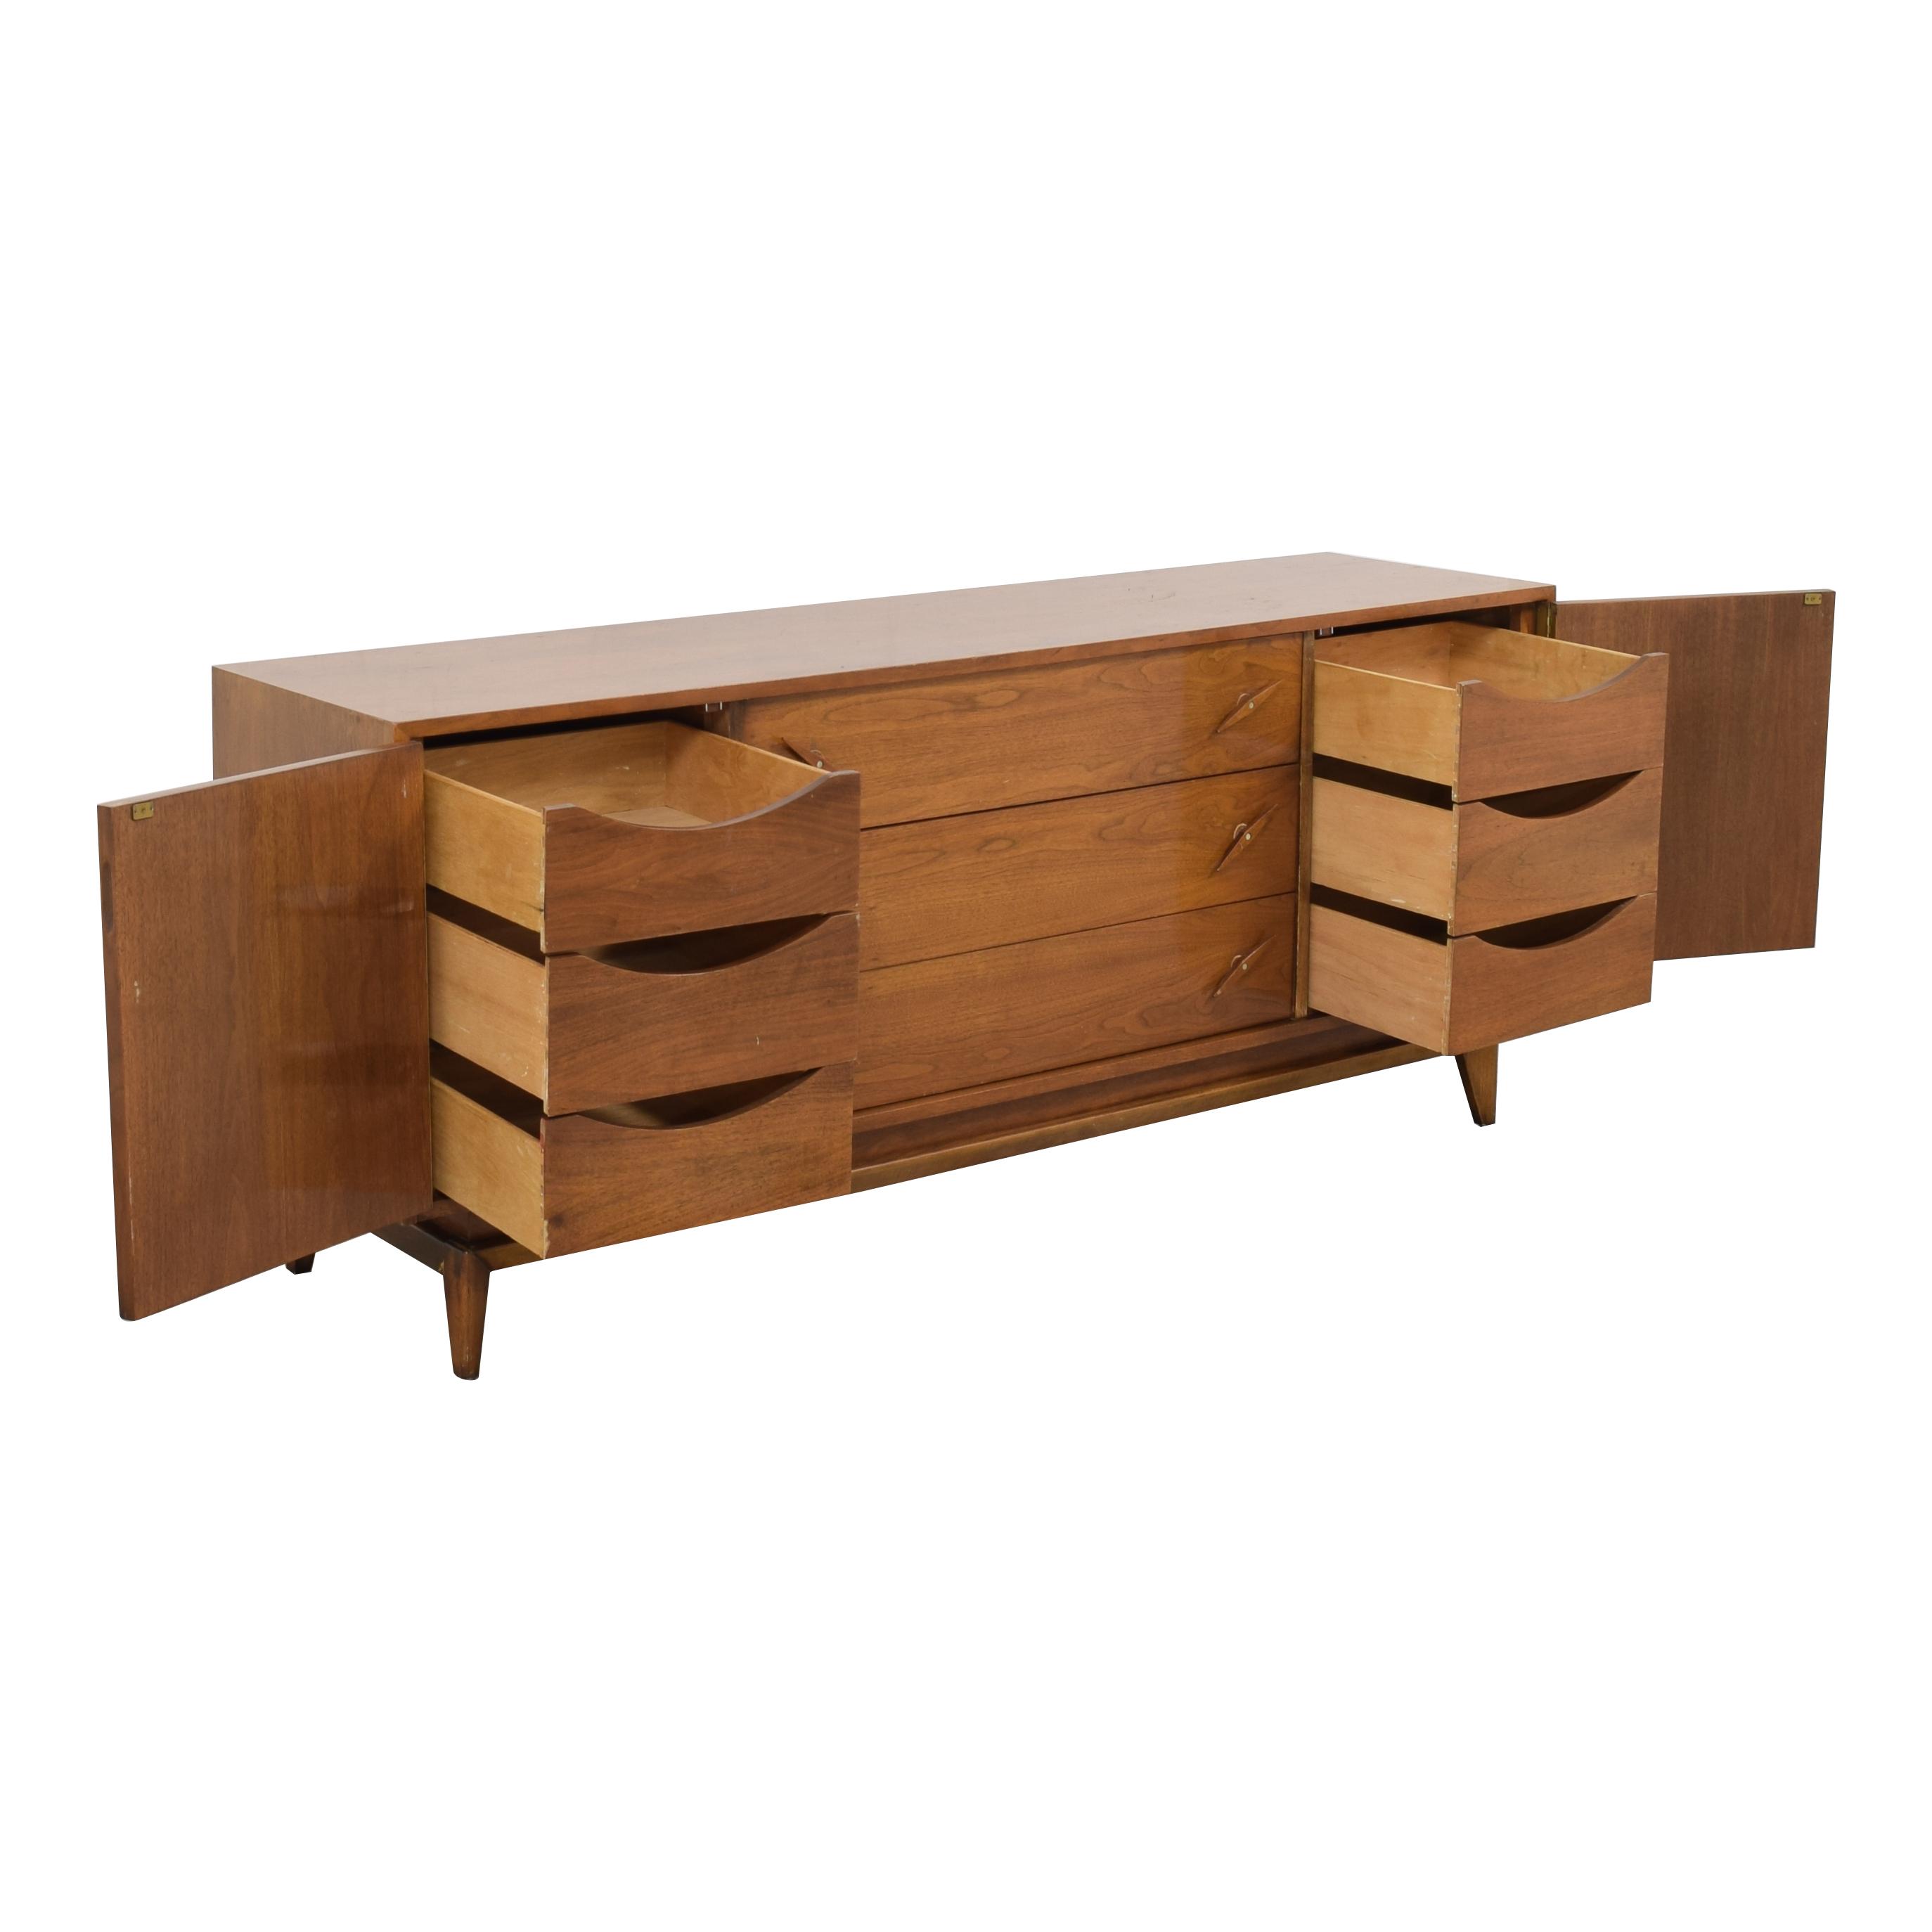 shop American of Martinsville American of Martinsville Mid Century Credenza Dresser online